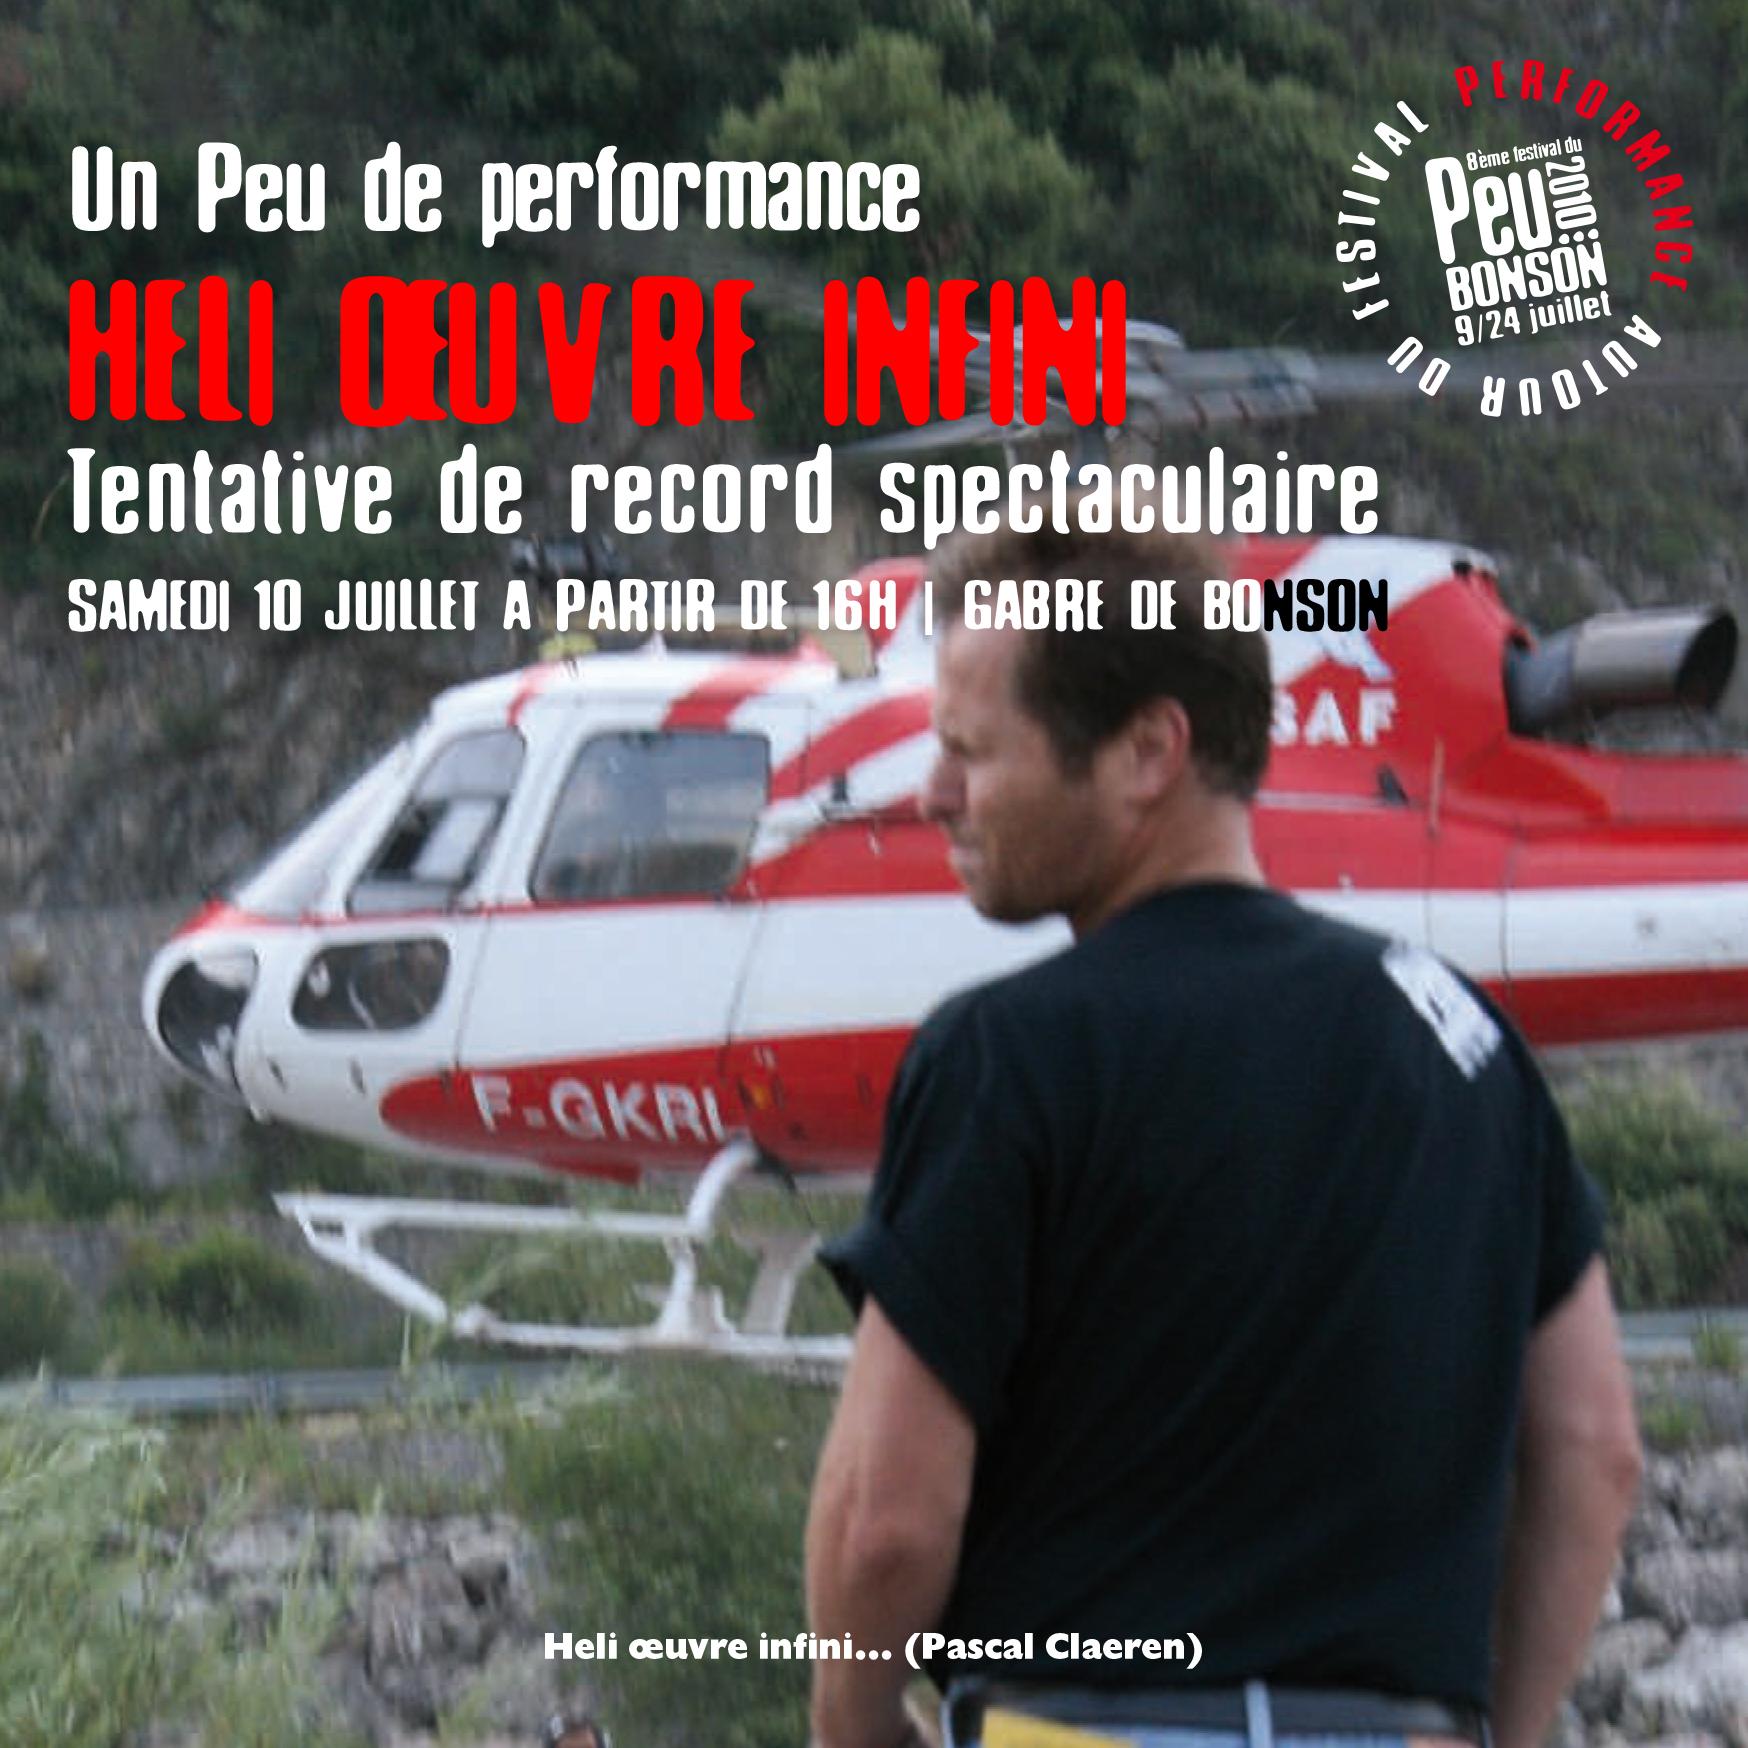 fiches PerformancePascale 2 site